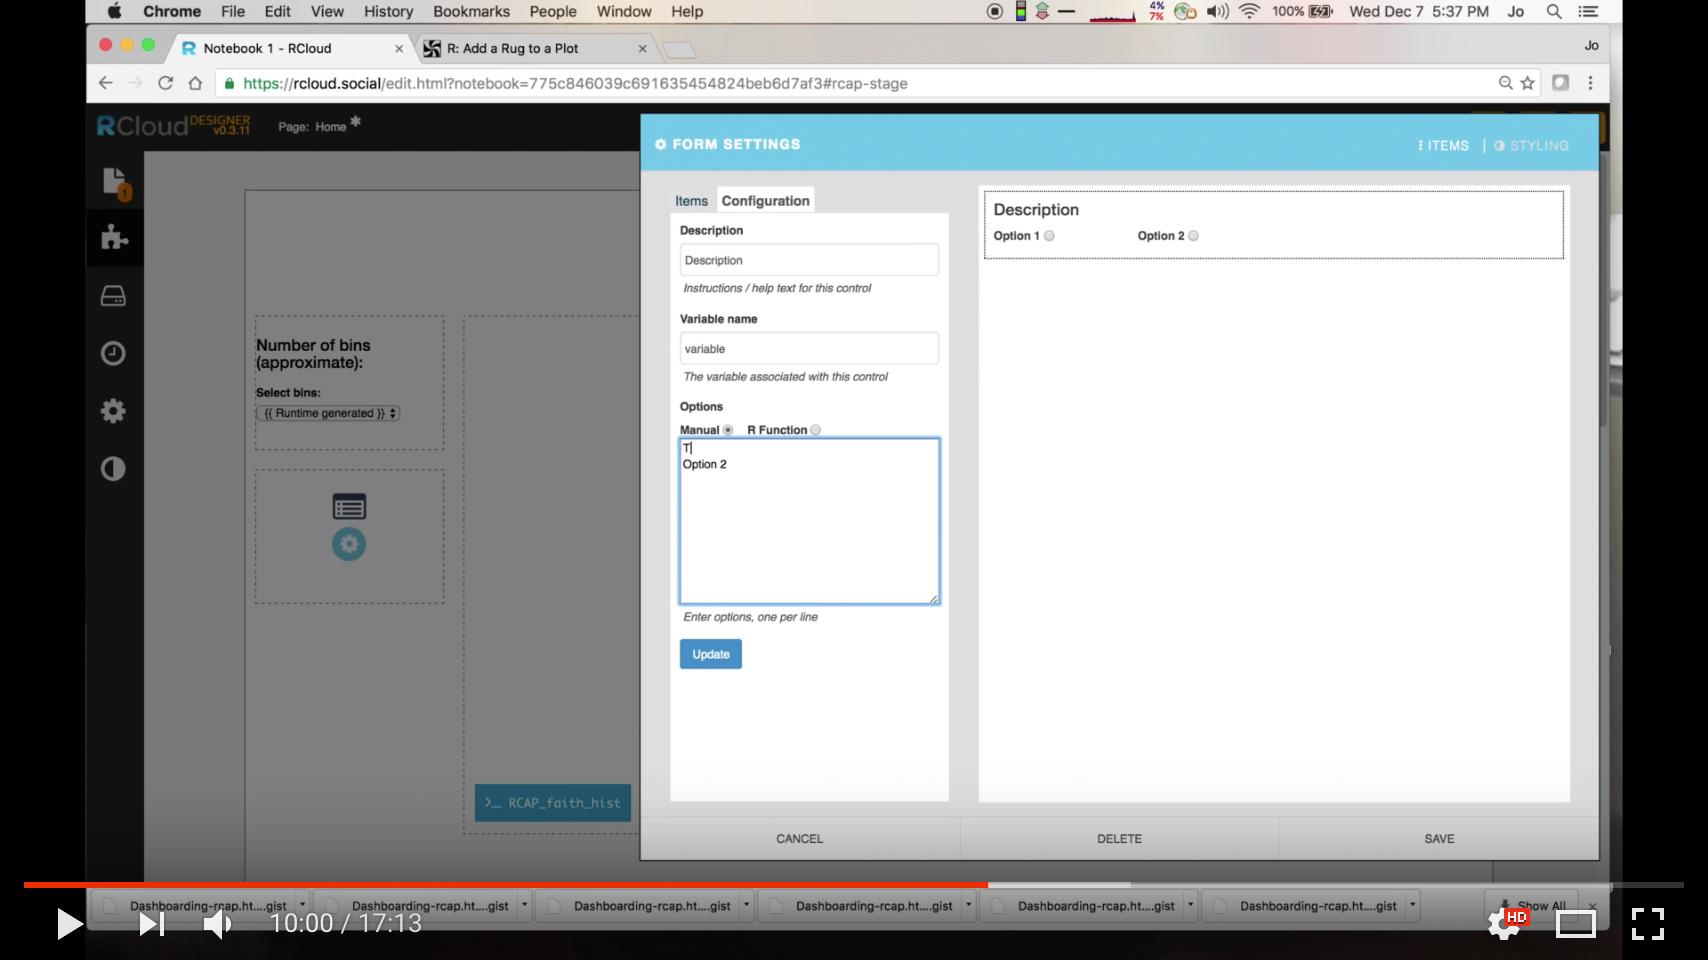 RCAP Example on YouTube